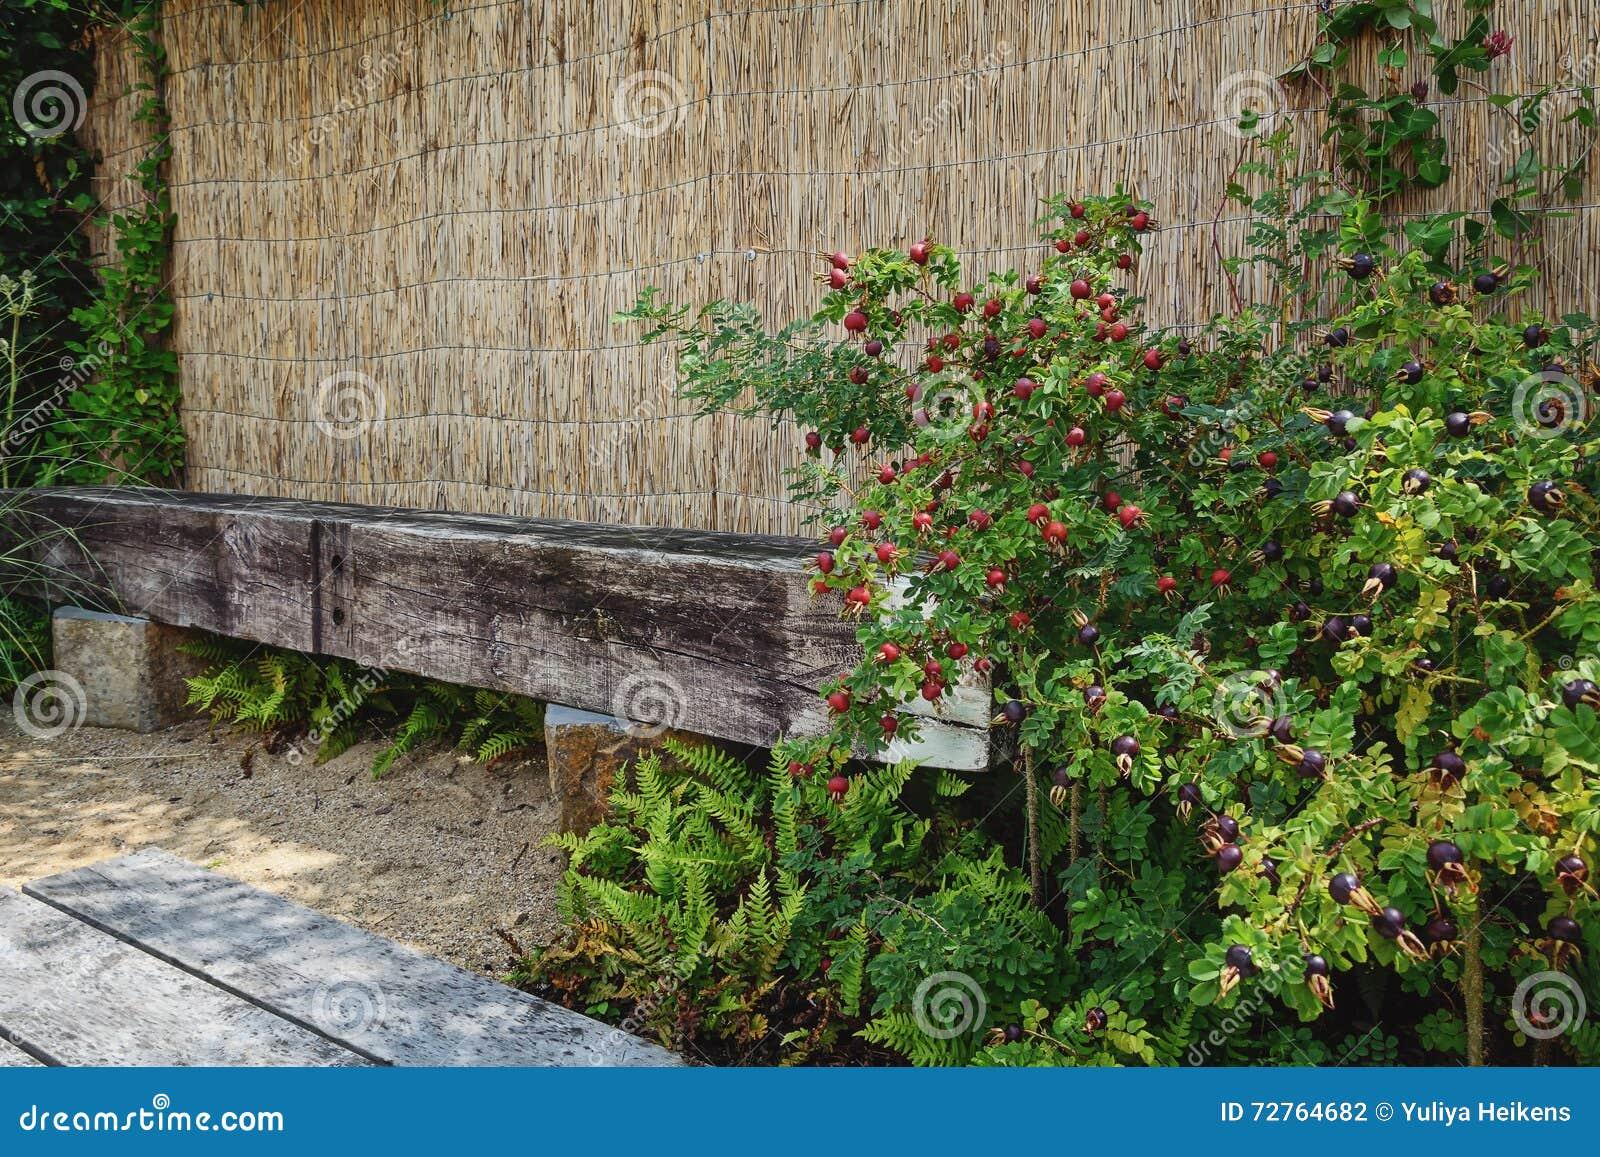 Mooi tuinidee in modeltuinen appeltern nederland stock foto